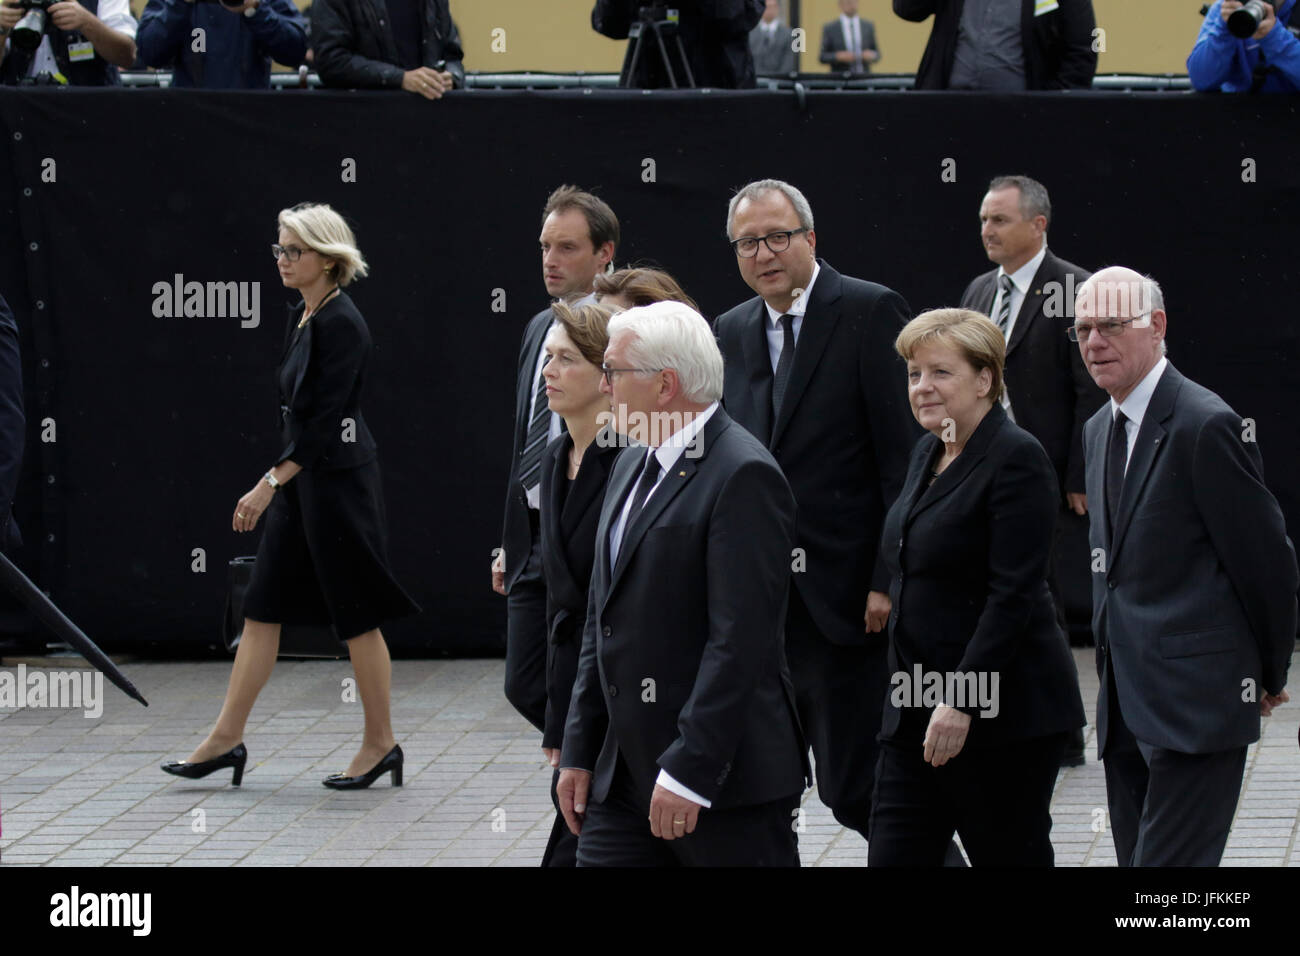 Speyer, Germany. 1st July 2017. Frank-Walter Steinmeier (2nd left), the President of Germany, his wife Elke Budenbender - Stock Image